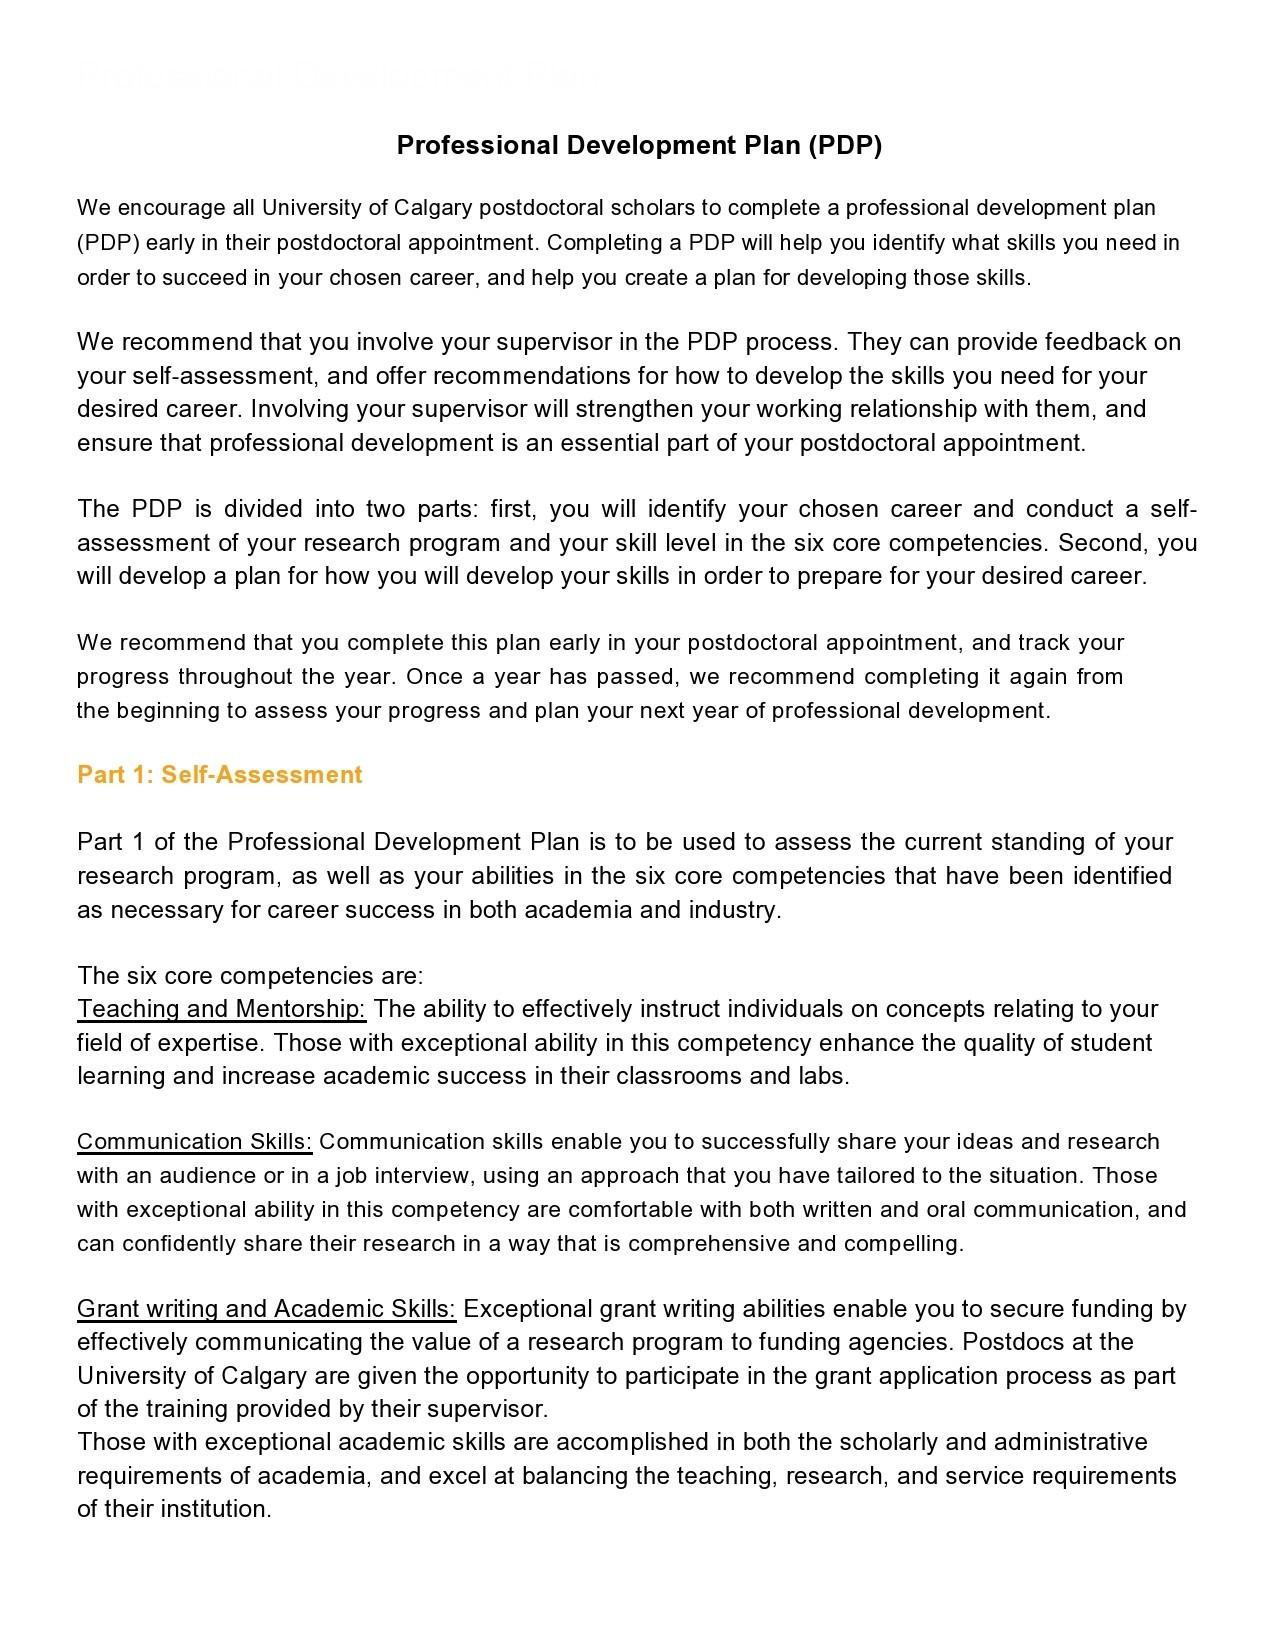 Free professional development plan 17